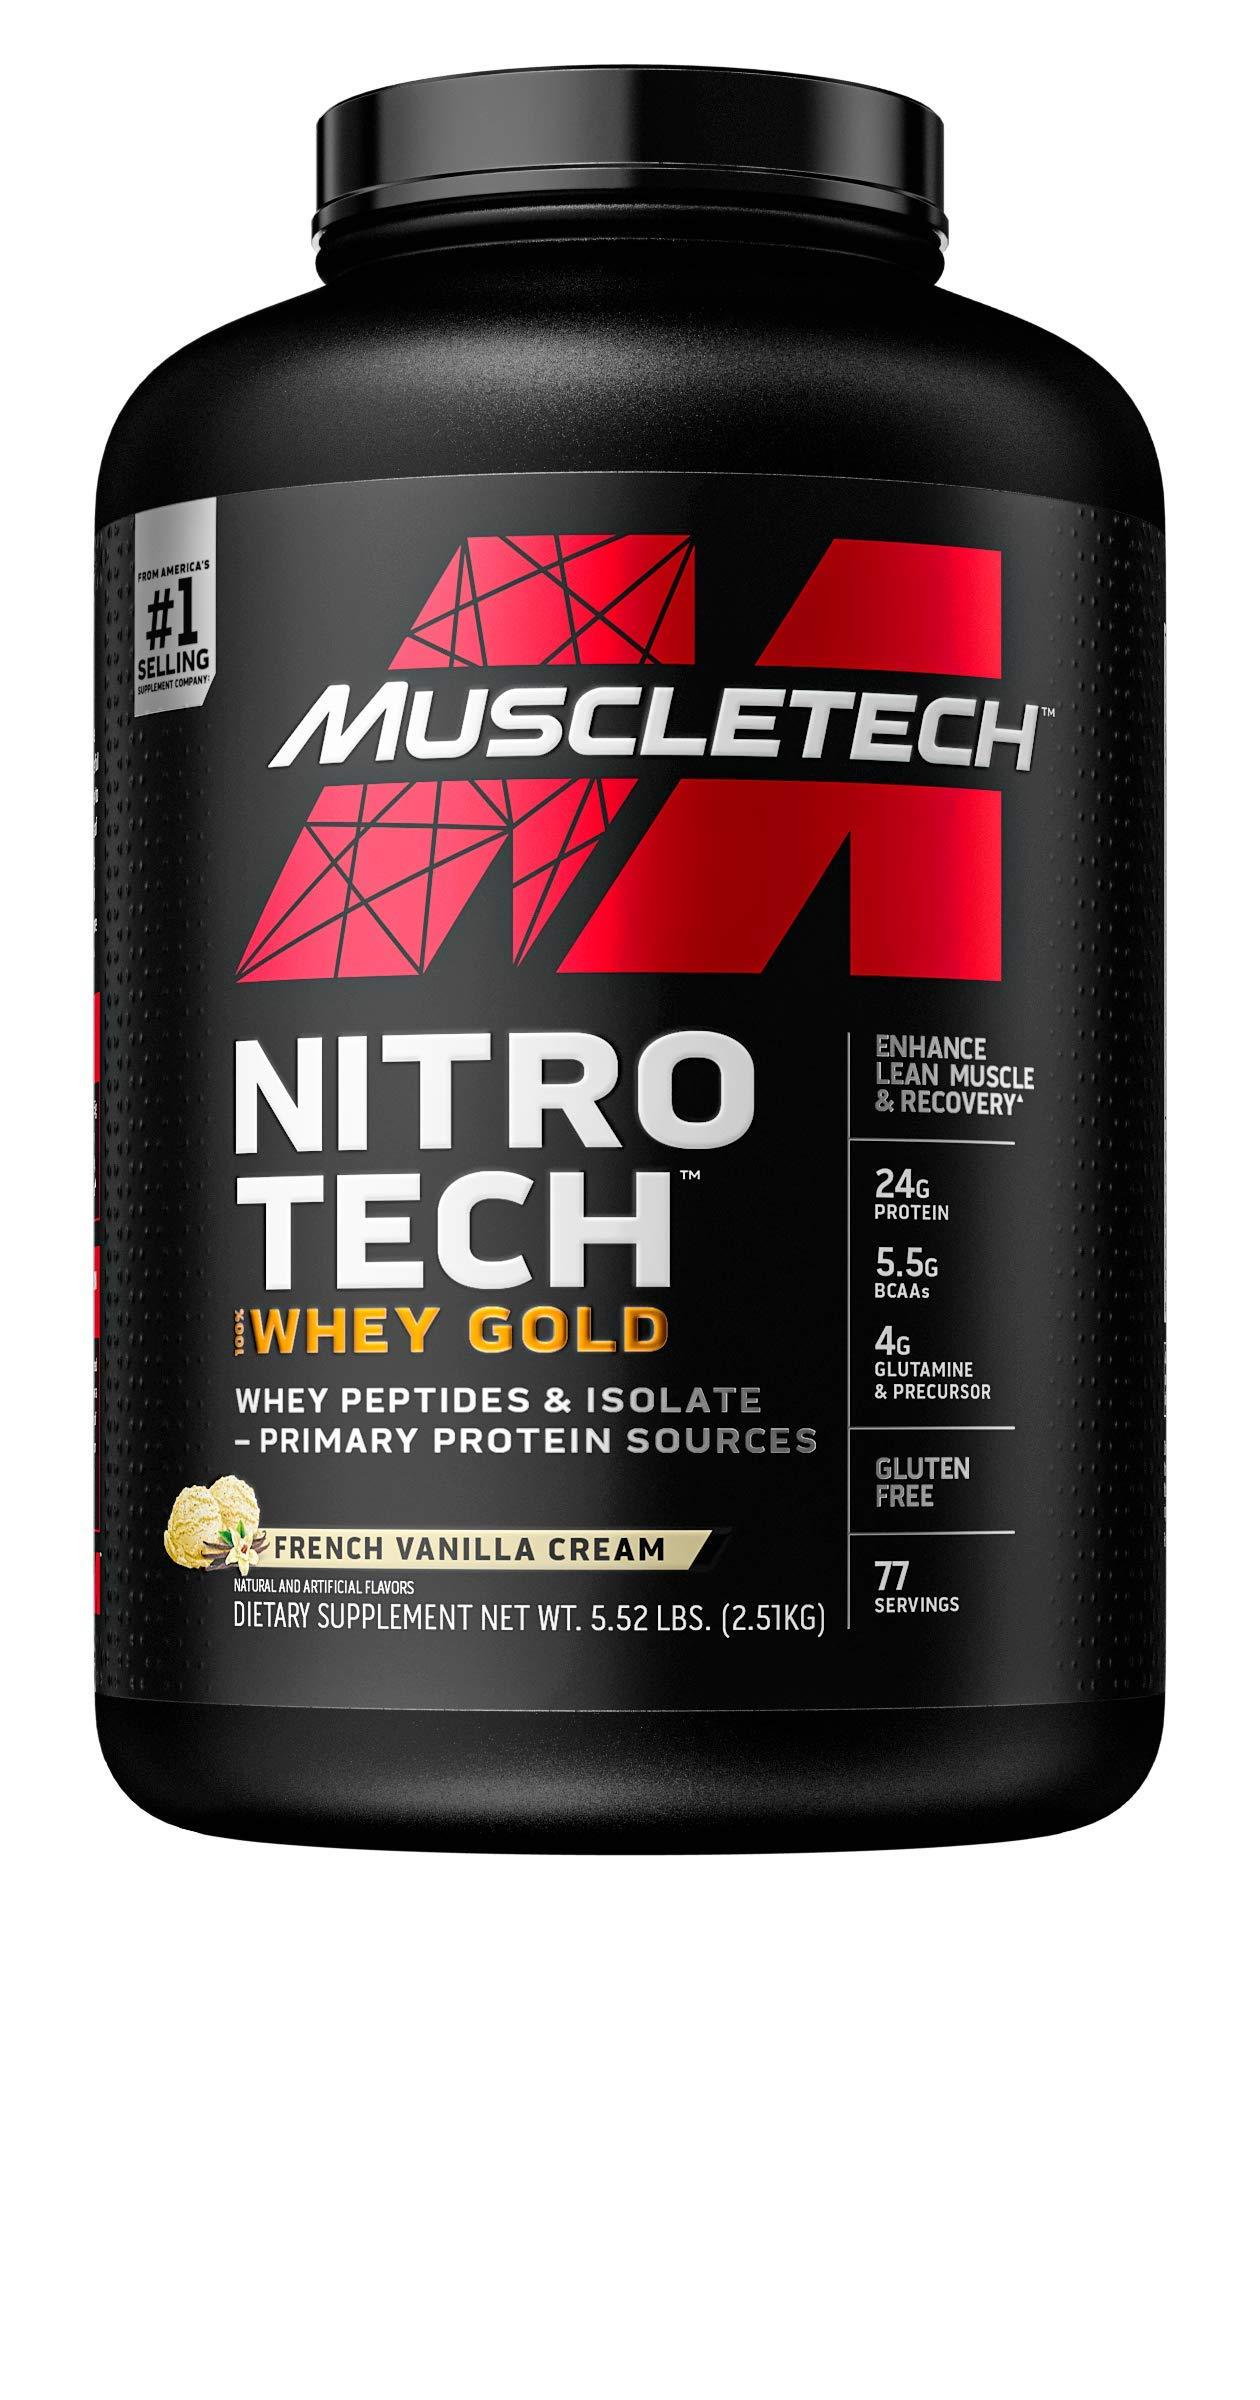 Whey Protein Powder | MuscleTech Nitro-Tech Whey Gold Protein Powder | Whey Protein Isolate Smoothie Mix | Protein Powder for Women & Men | Vanilla Protein Powder, 5.5 lbs (77 Serv)-package varies